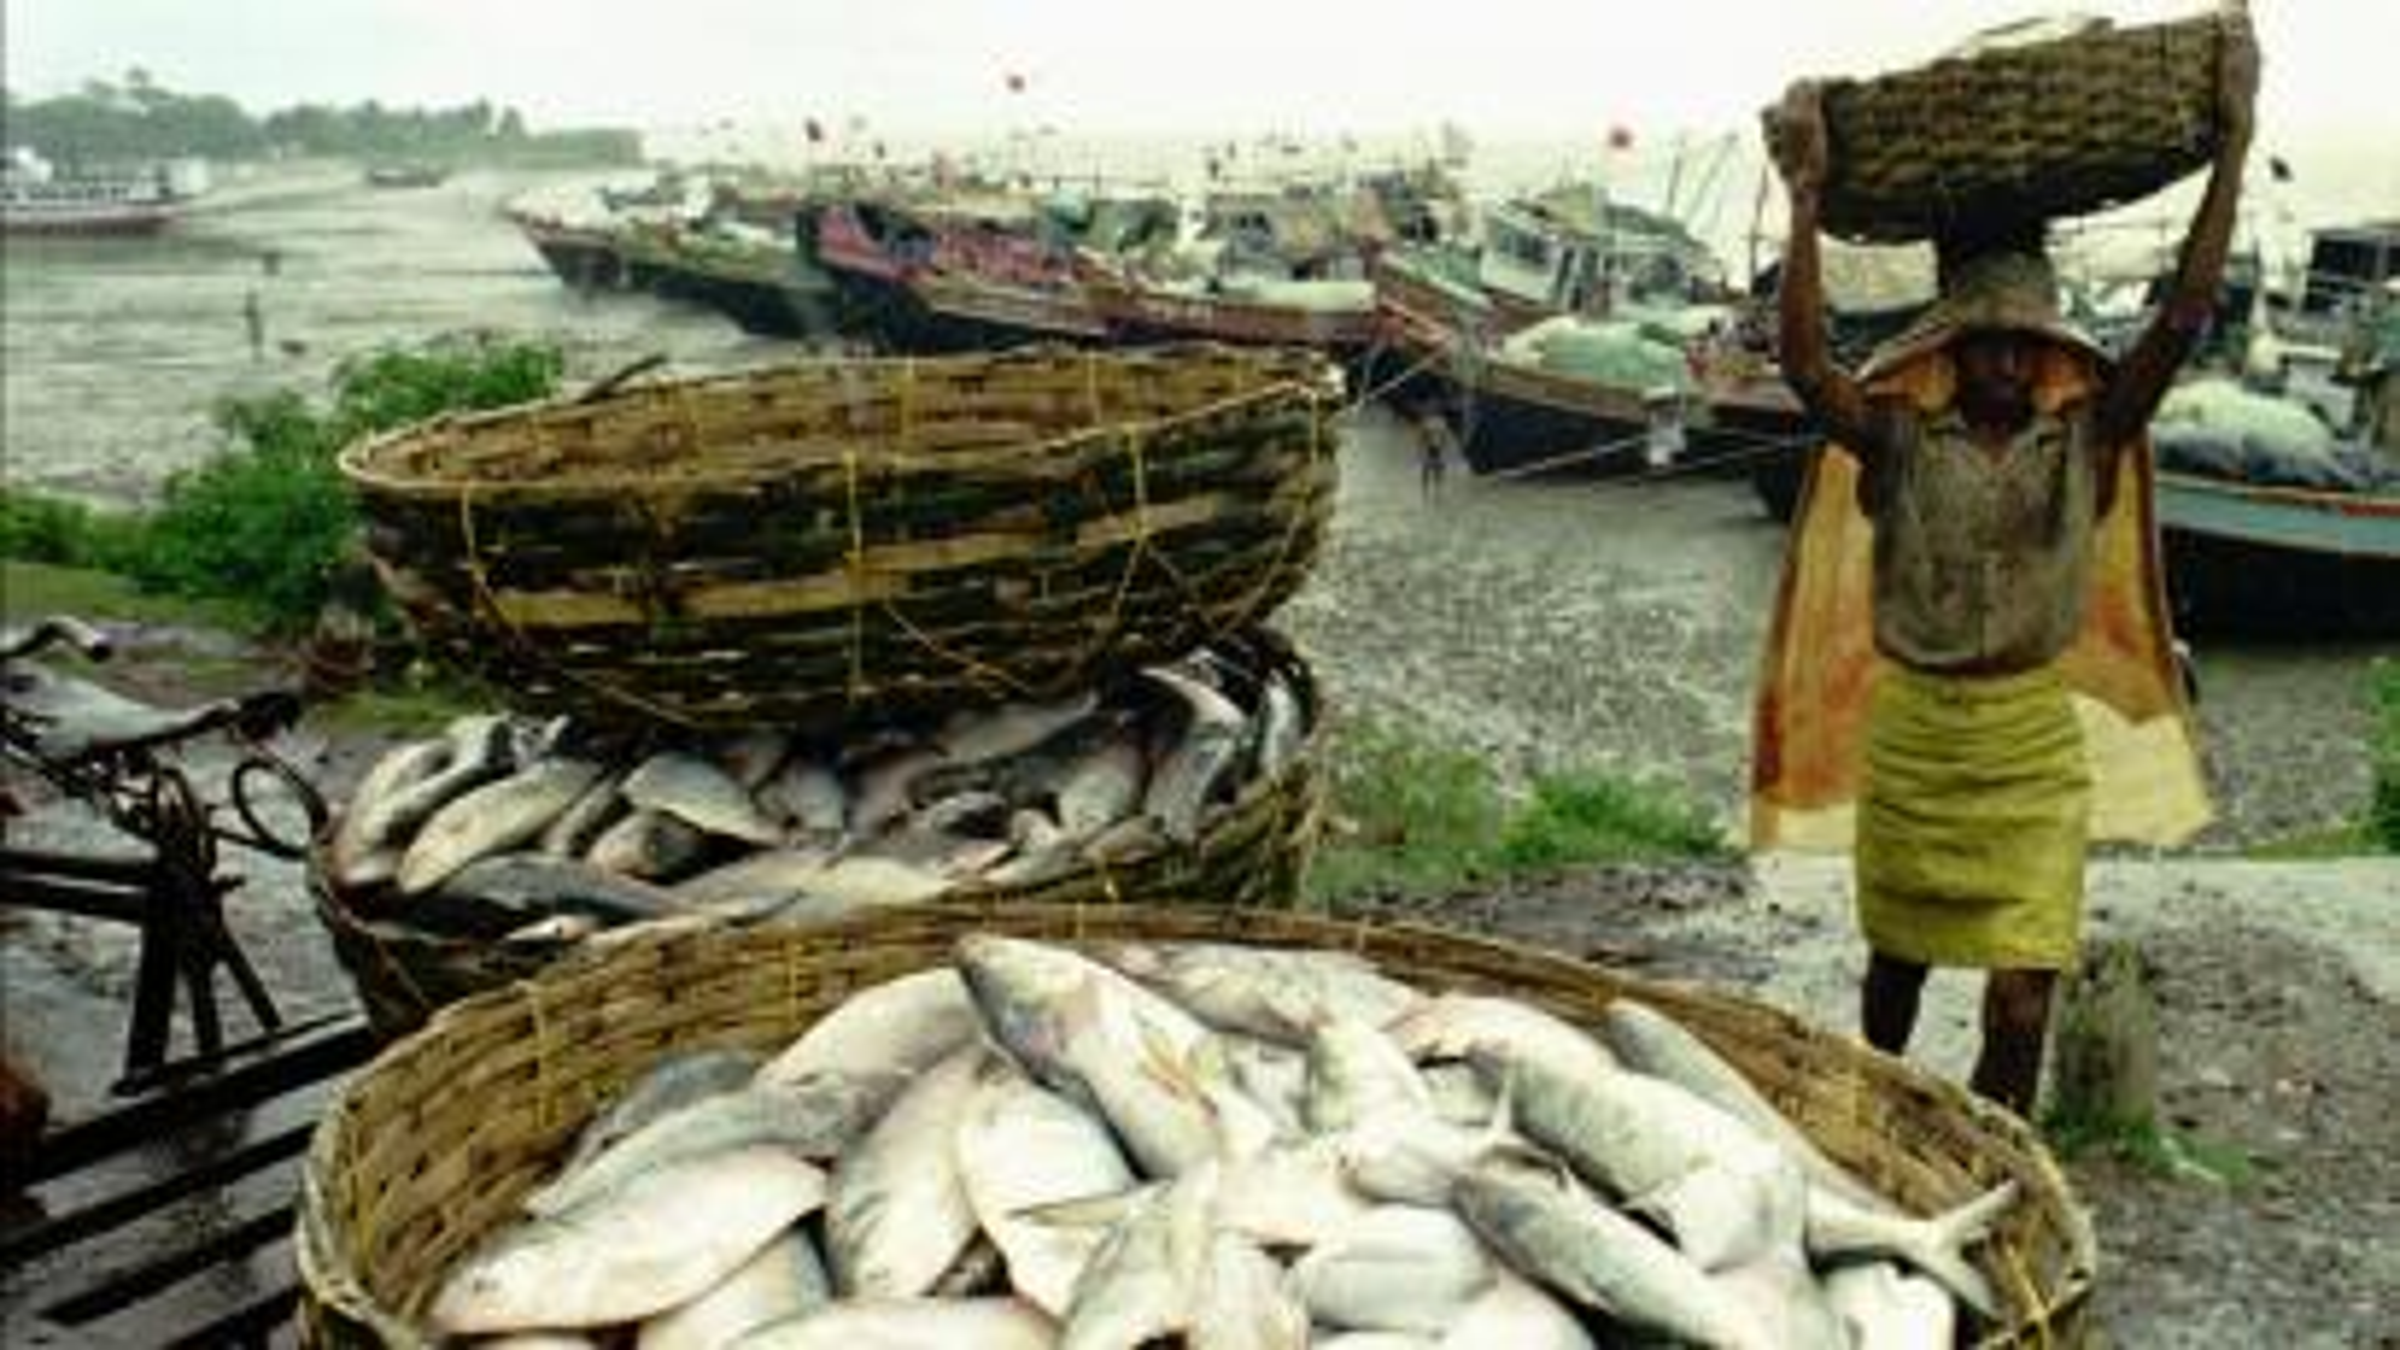 Hilsa fish fishing